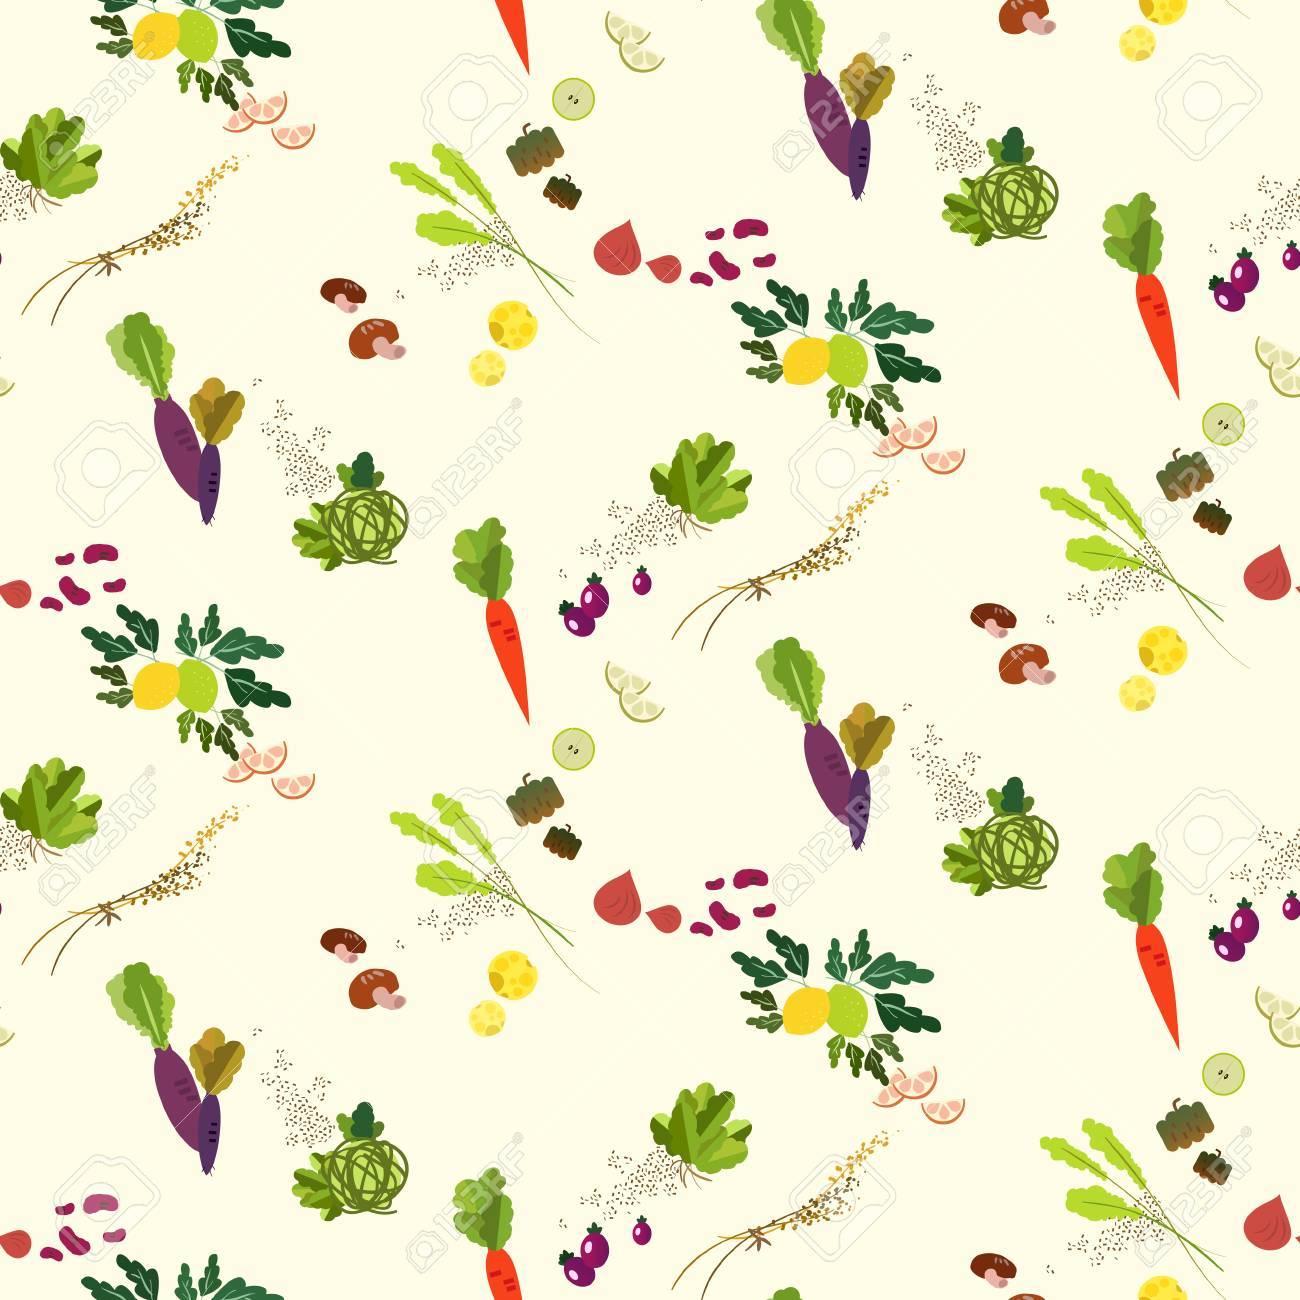 Lovely vegetables and fruit seamless pattern design - 61192554